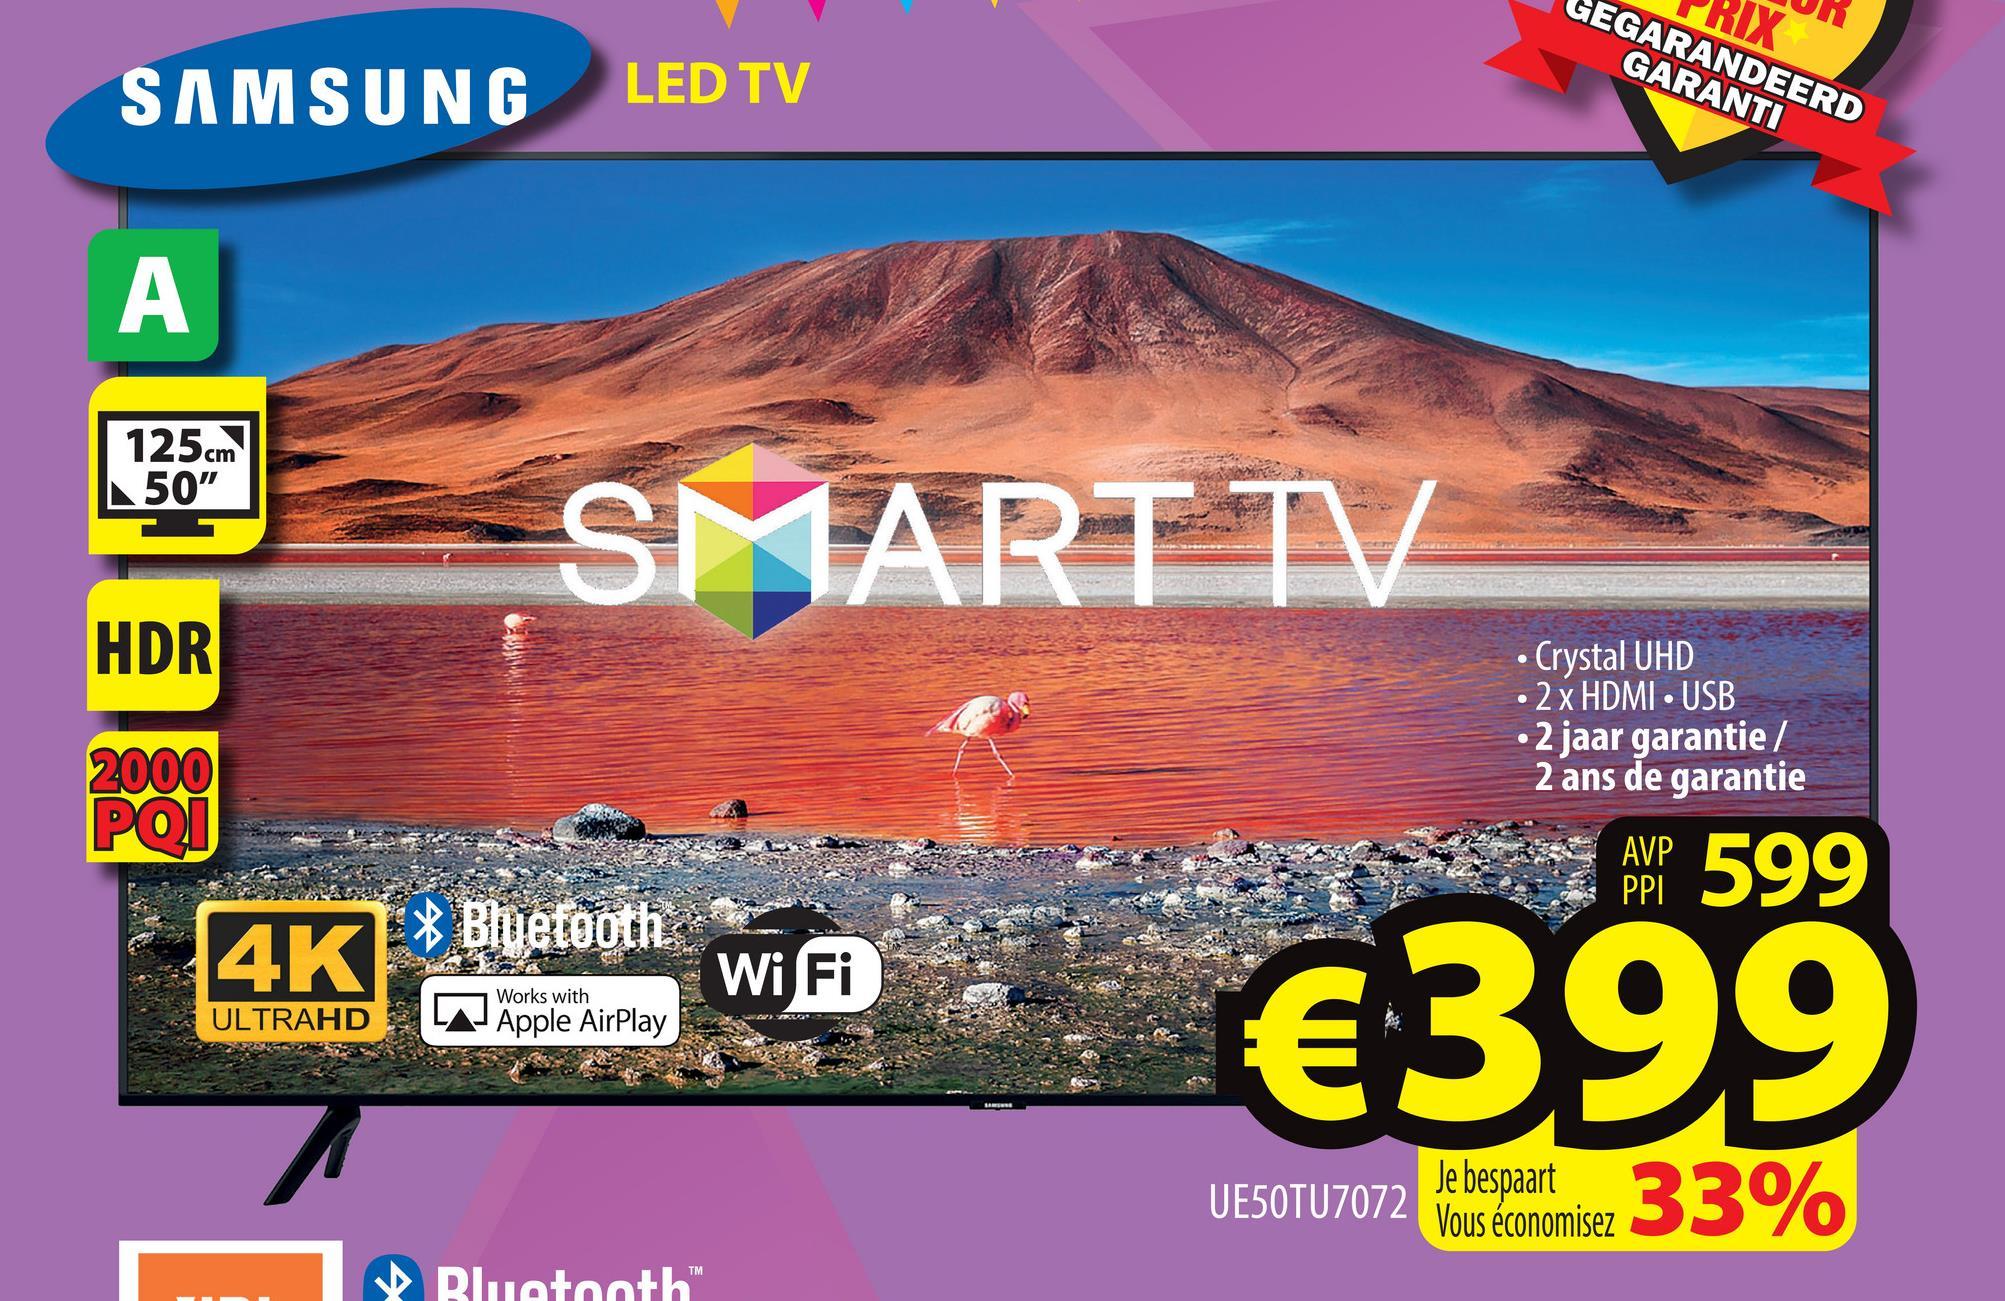 "IX EGARANDEERD GARANTI SAMSUNG LED TV A 125 cm 50"" SMART TV HDR • Crystal UHD • 2 x HDMI USB • 2 jaar garantie / 2 ans de garantie 2000 POI AVP PPI 599 4K E* Bluetooth WiFi S. Works with ULTRAHD Apple AirPlay €399 UE50TU7072 Vous économisez 33% TM Bluetooth"